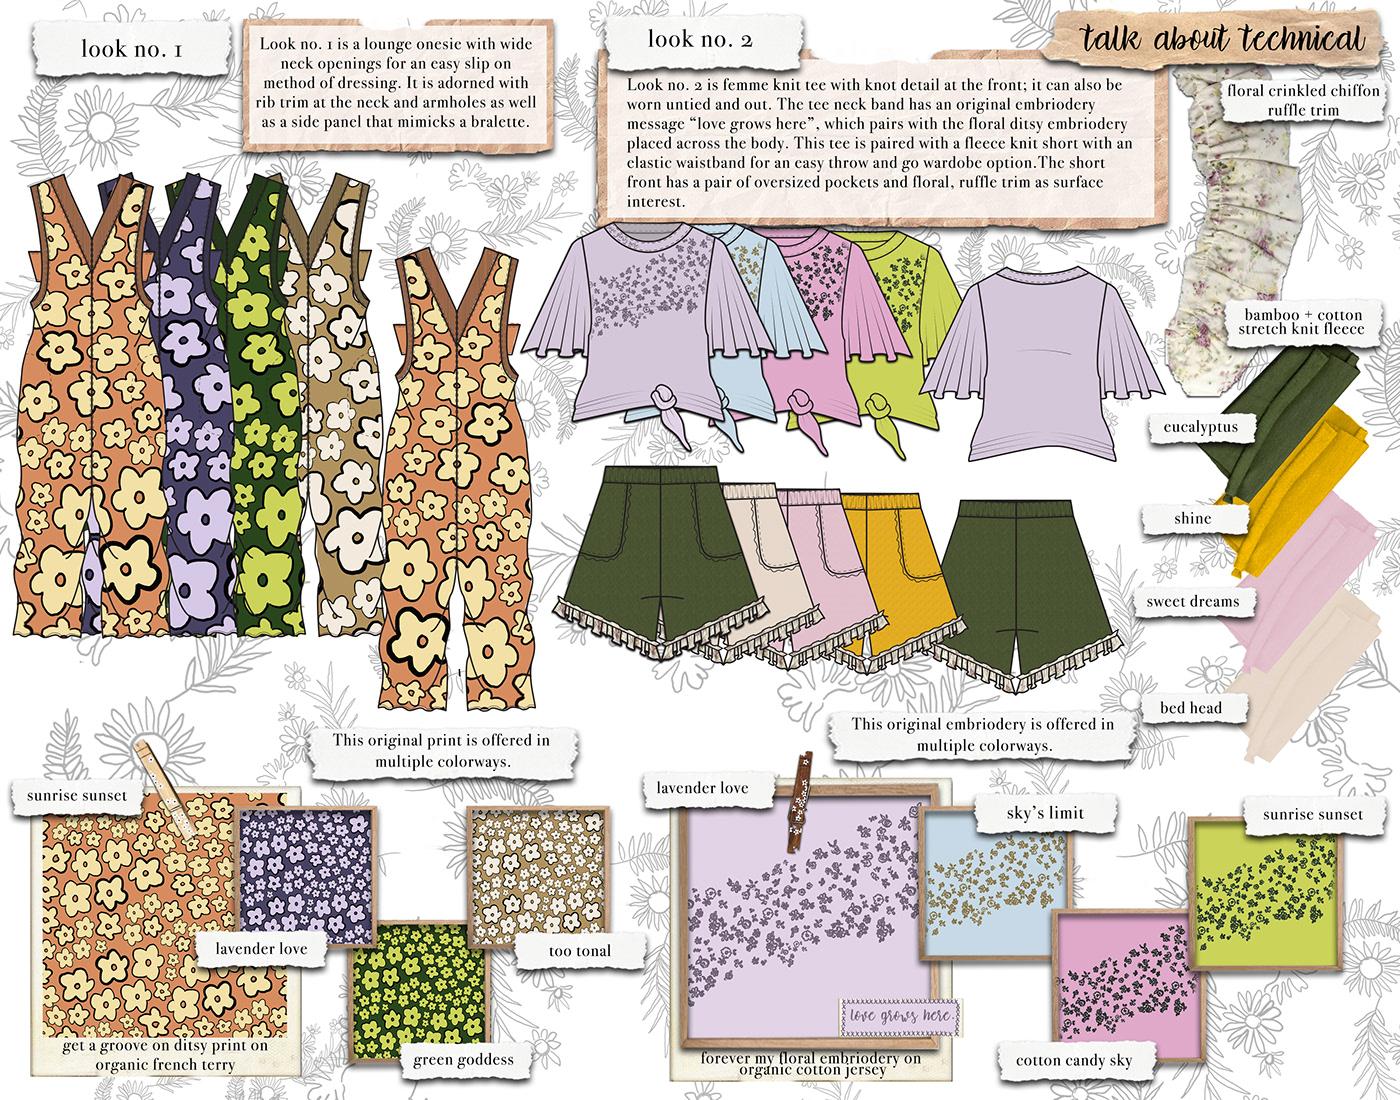 concept development Fabric sourcing  Fashion  fashion design fashion illustration loungewear print design  surface design Technical Design womenswear